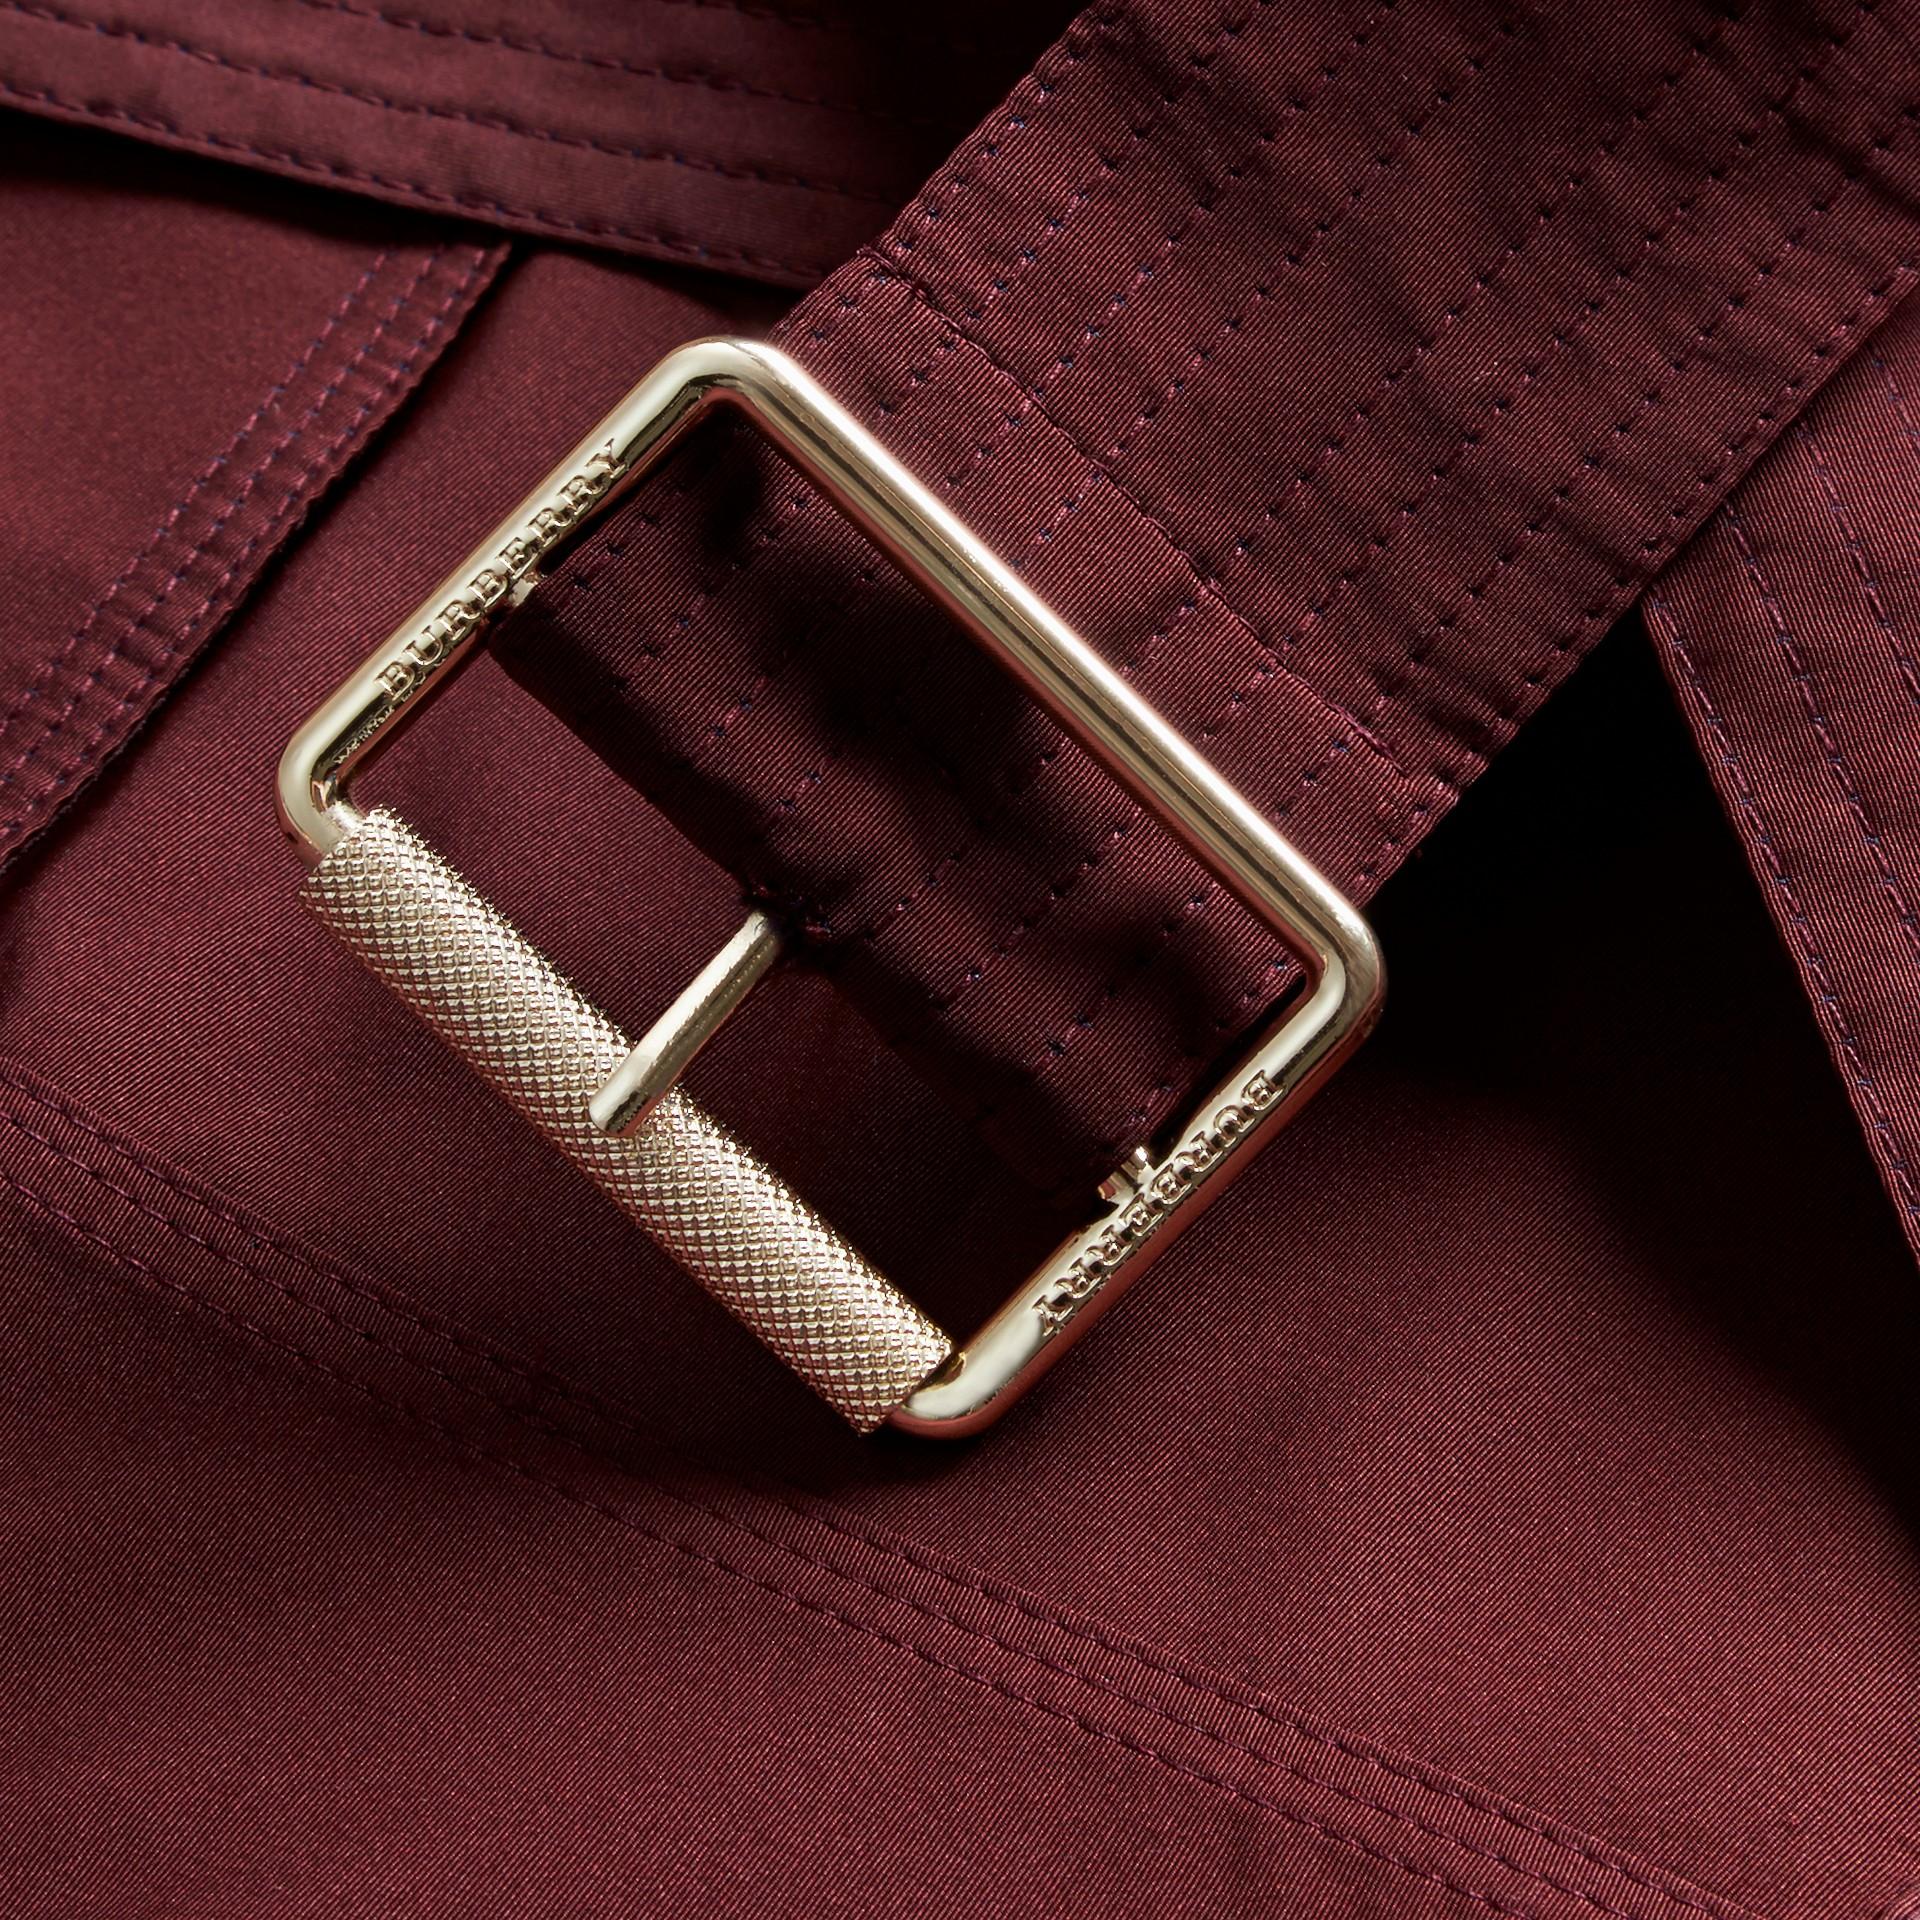 Deep claret Showerproof Taffeta Trench Jacket with Detachable Hood Deep Claret - gallery image 2